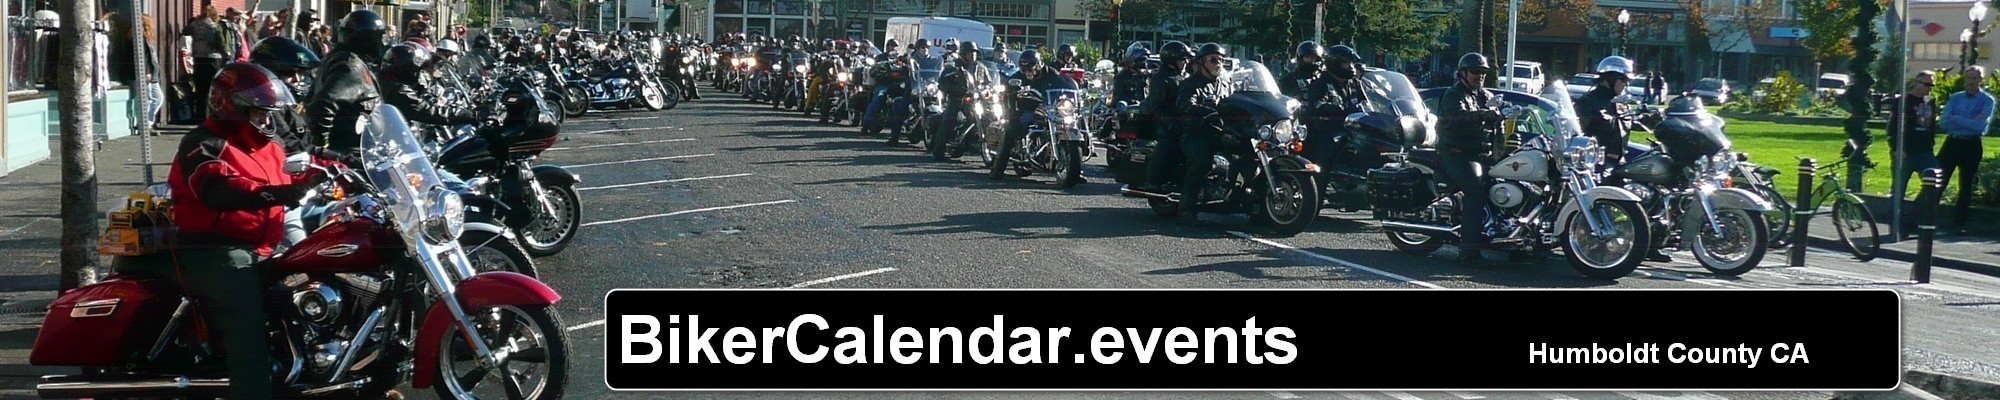 BikerCalendar.events Logo